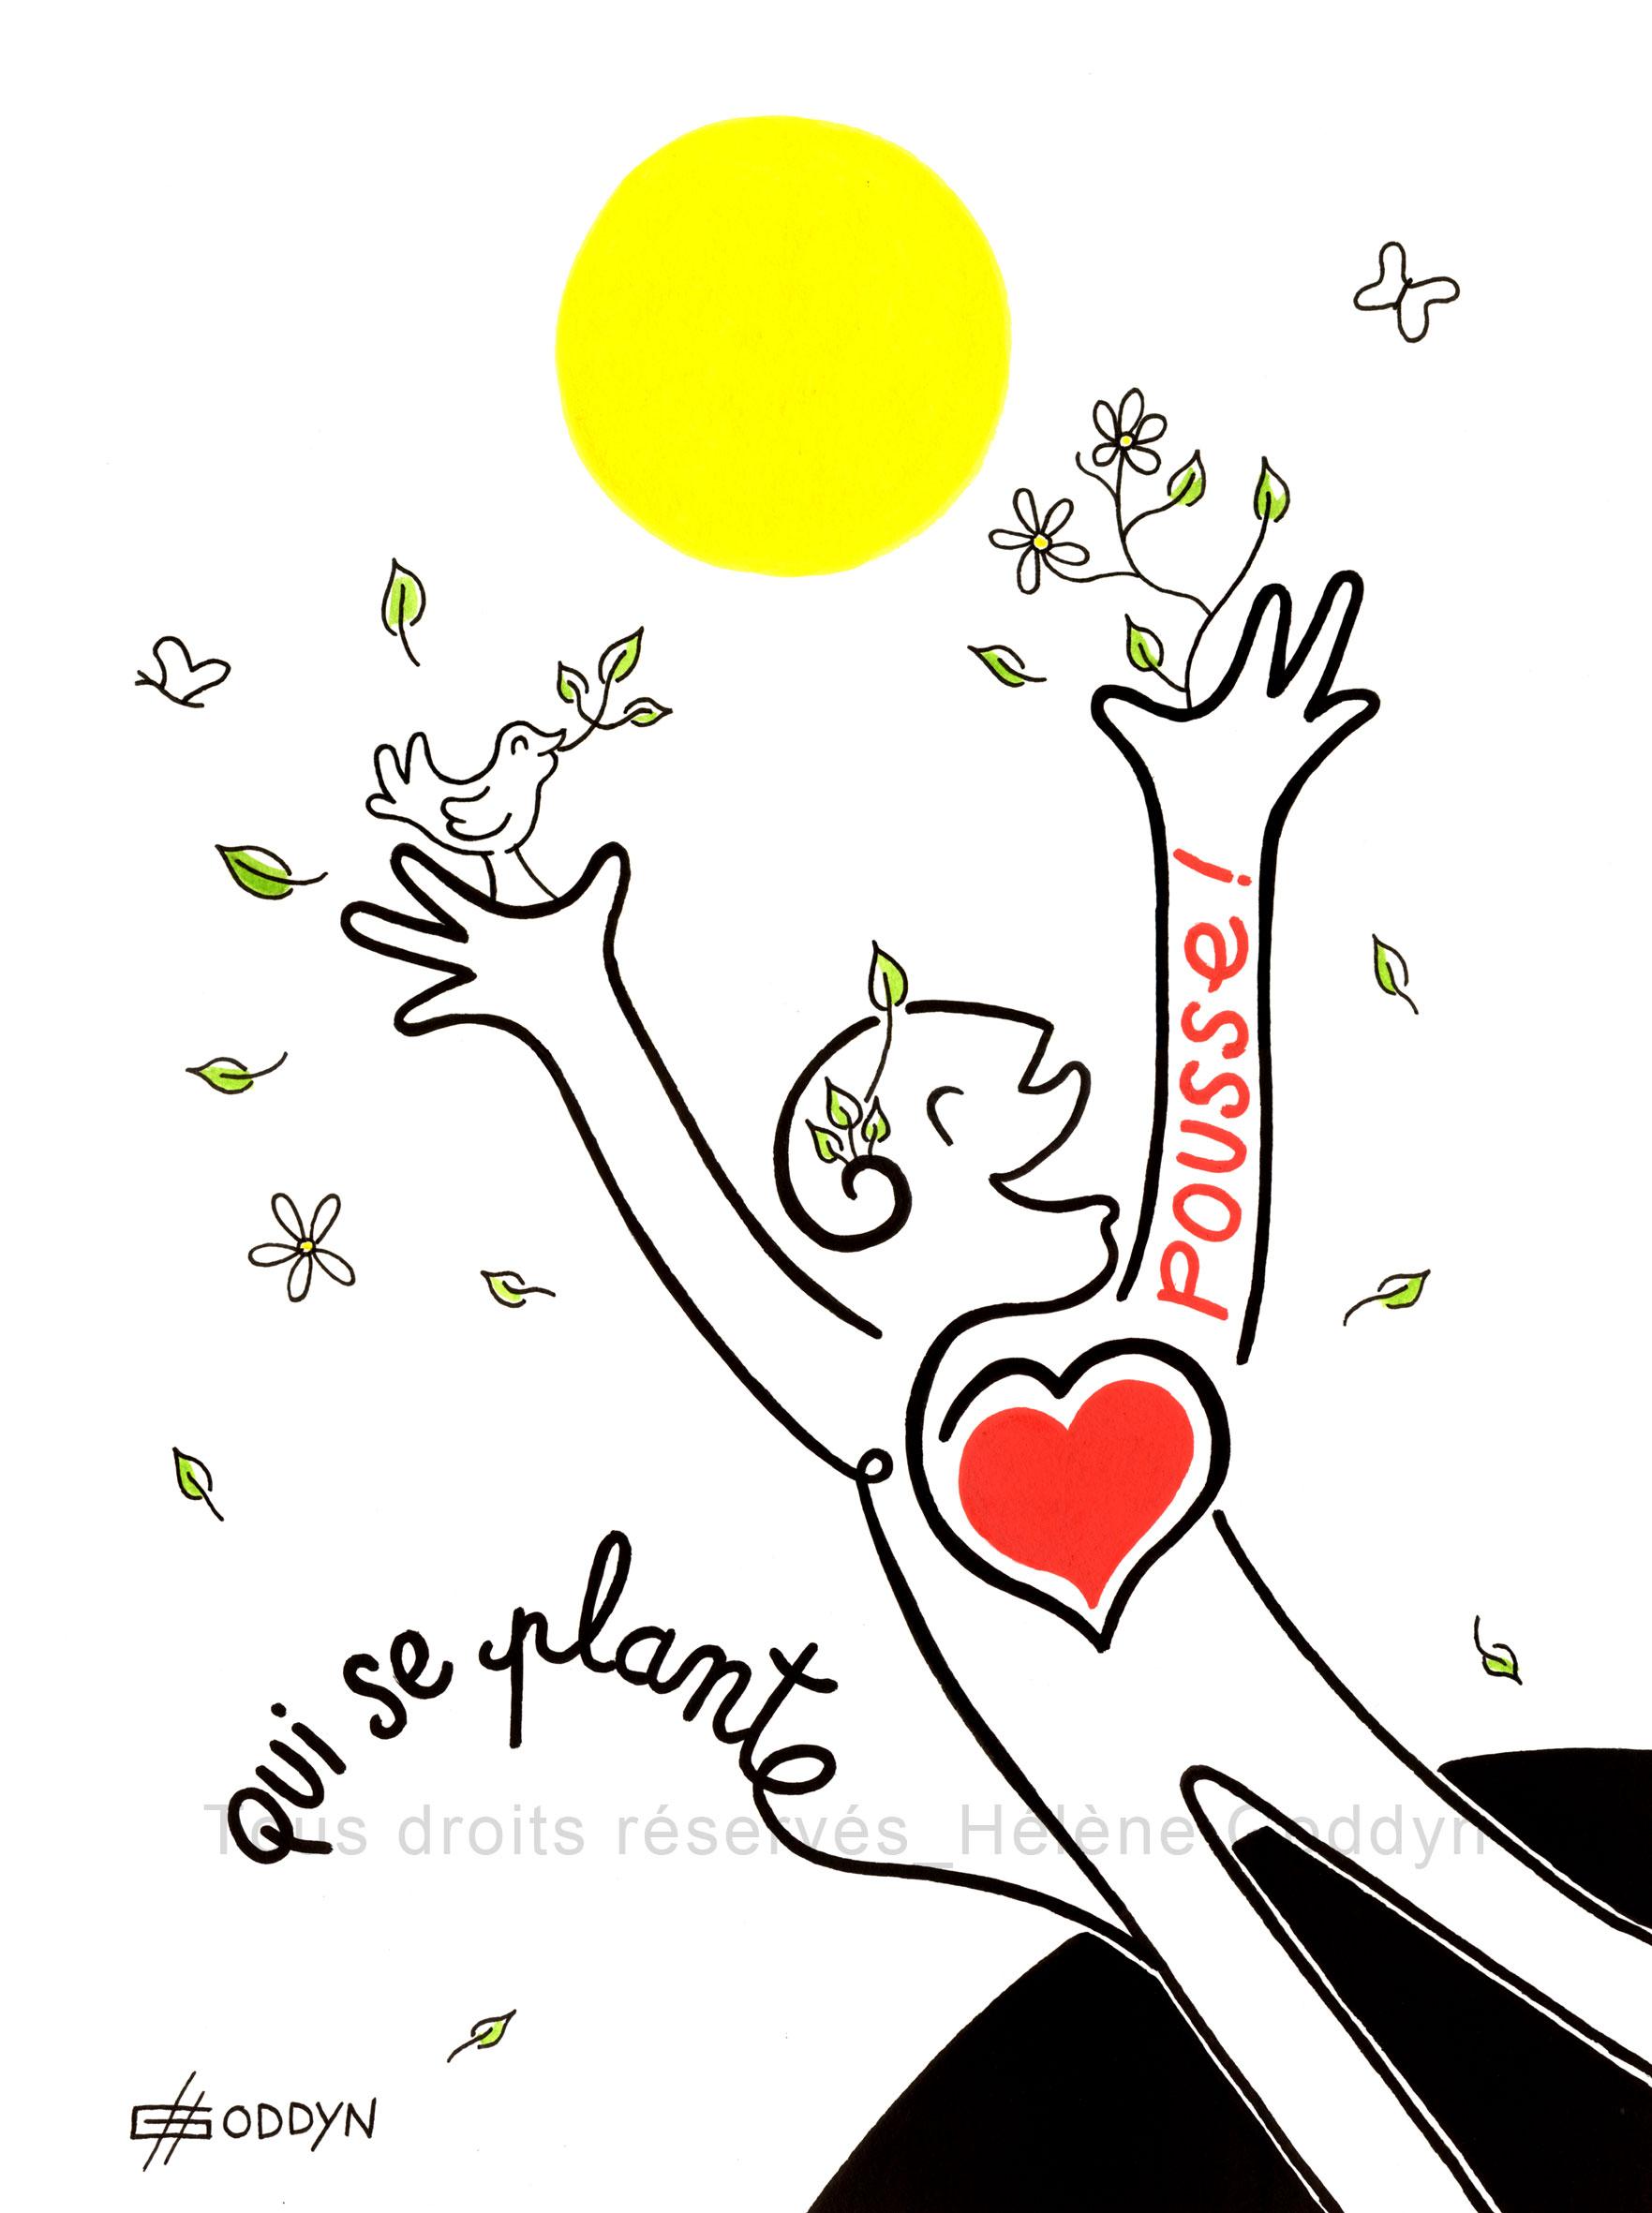 Au-fil-de-la-vie_--Qui-se-plante,-pousse-A3_dessin_Goddyn-Hélène-web